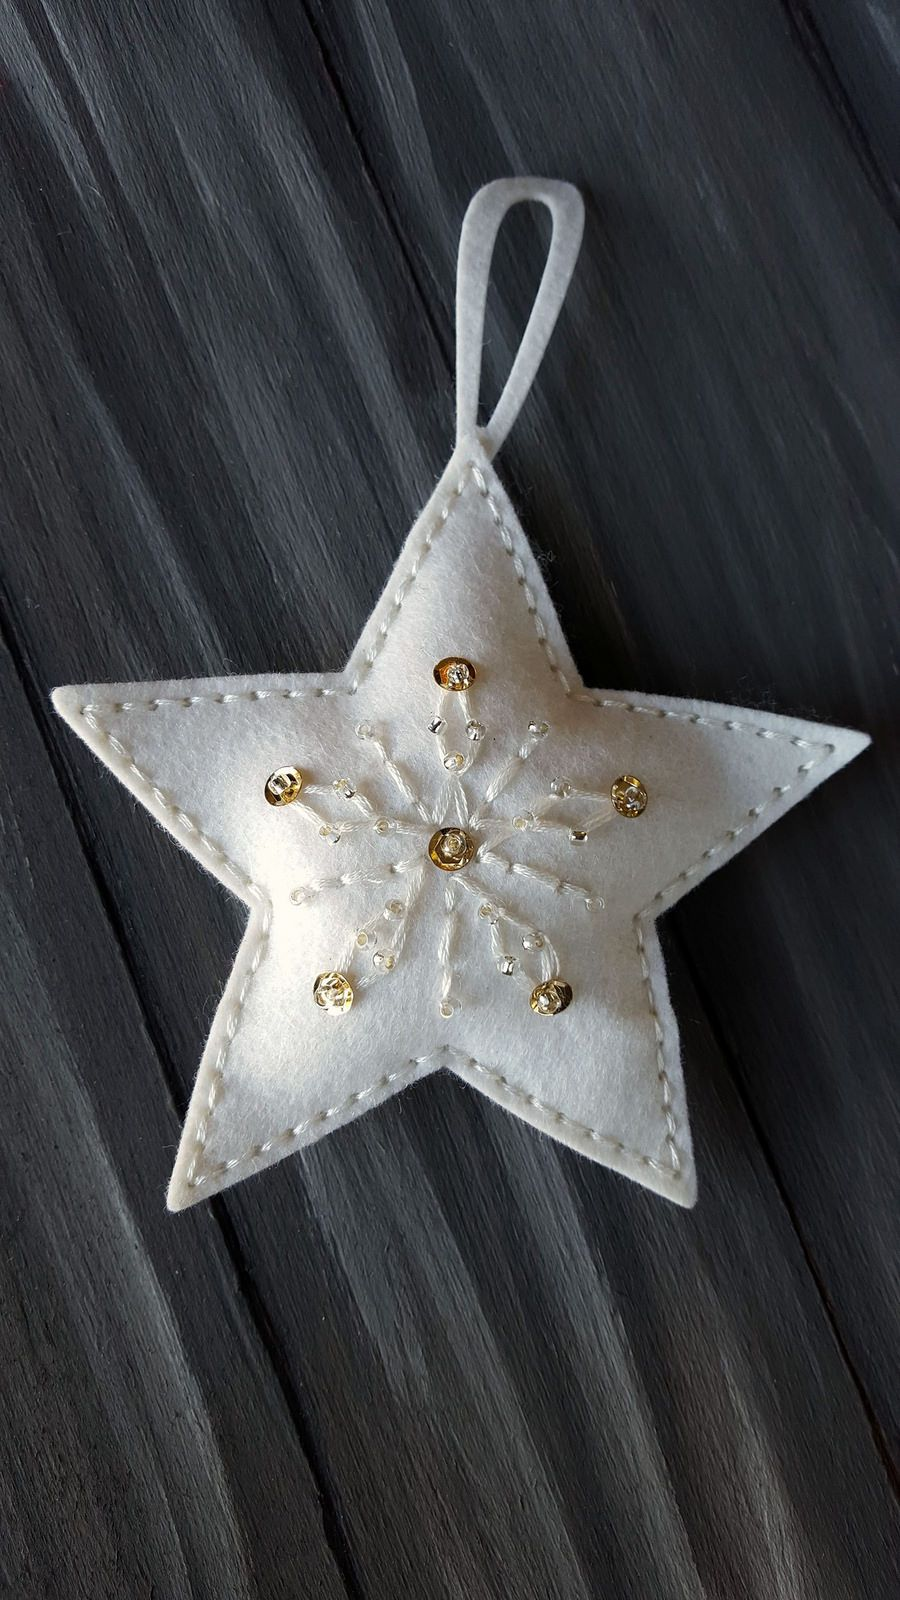 079 | Felting, Ornament and Felt ornaments : quilted ornaments to make - Adamdwight.com